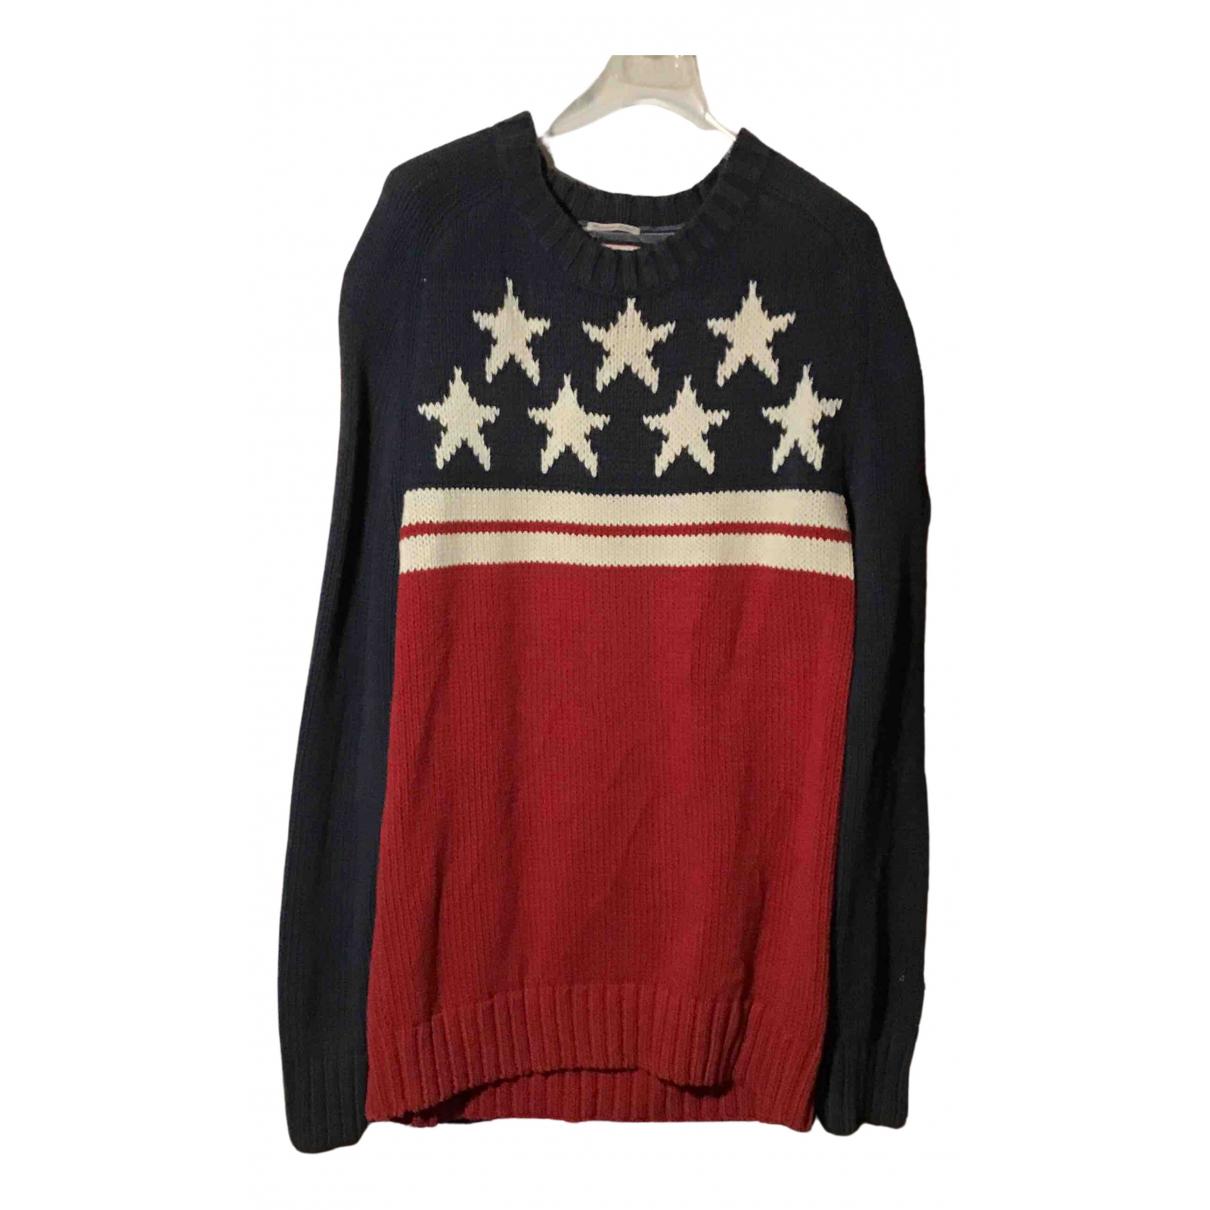 Tommy Hilfiger N Red Cotton Knitwear & Sweatshirts for Men L International